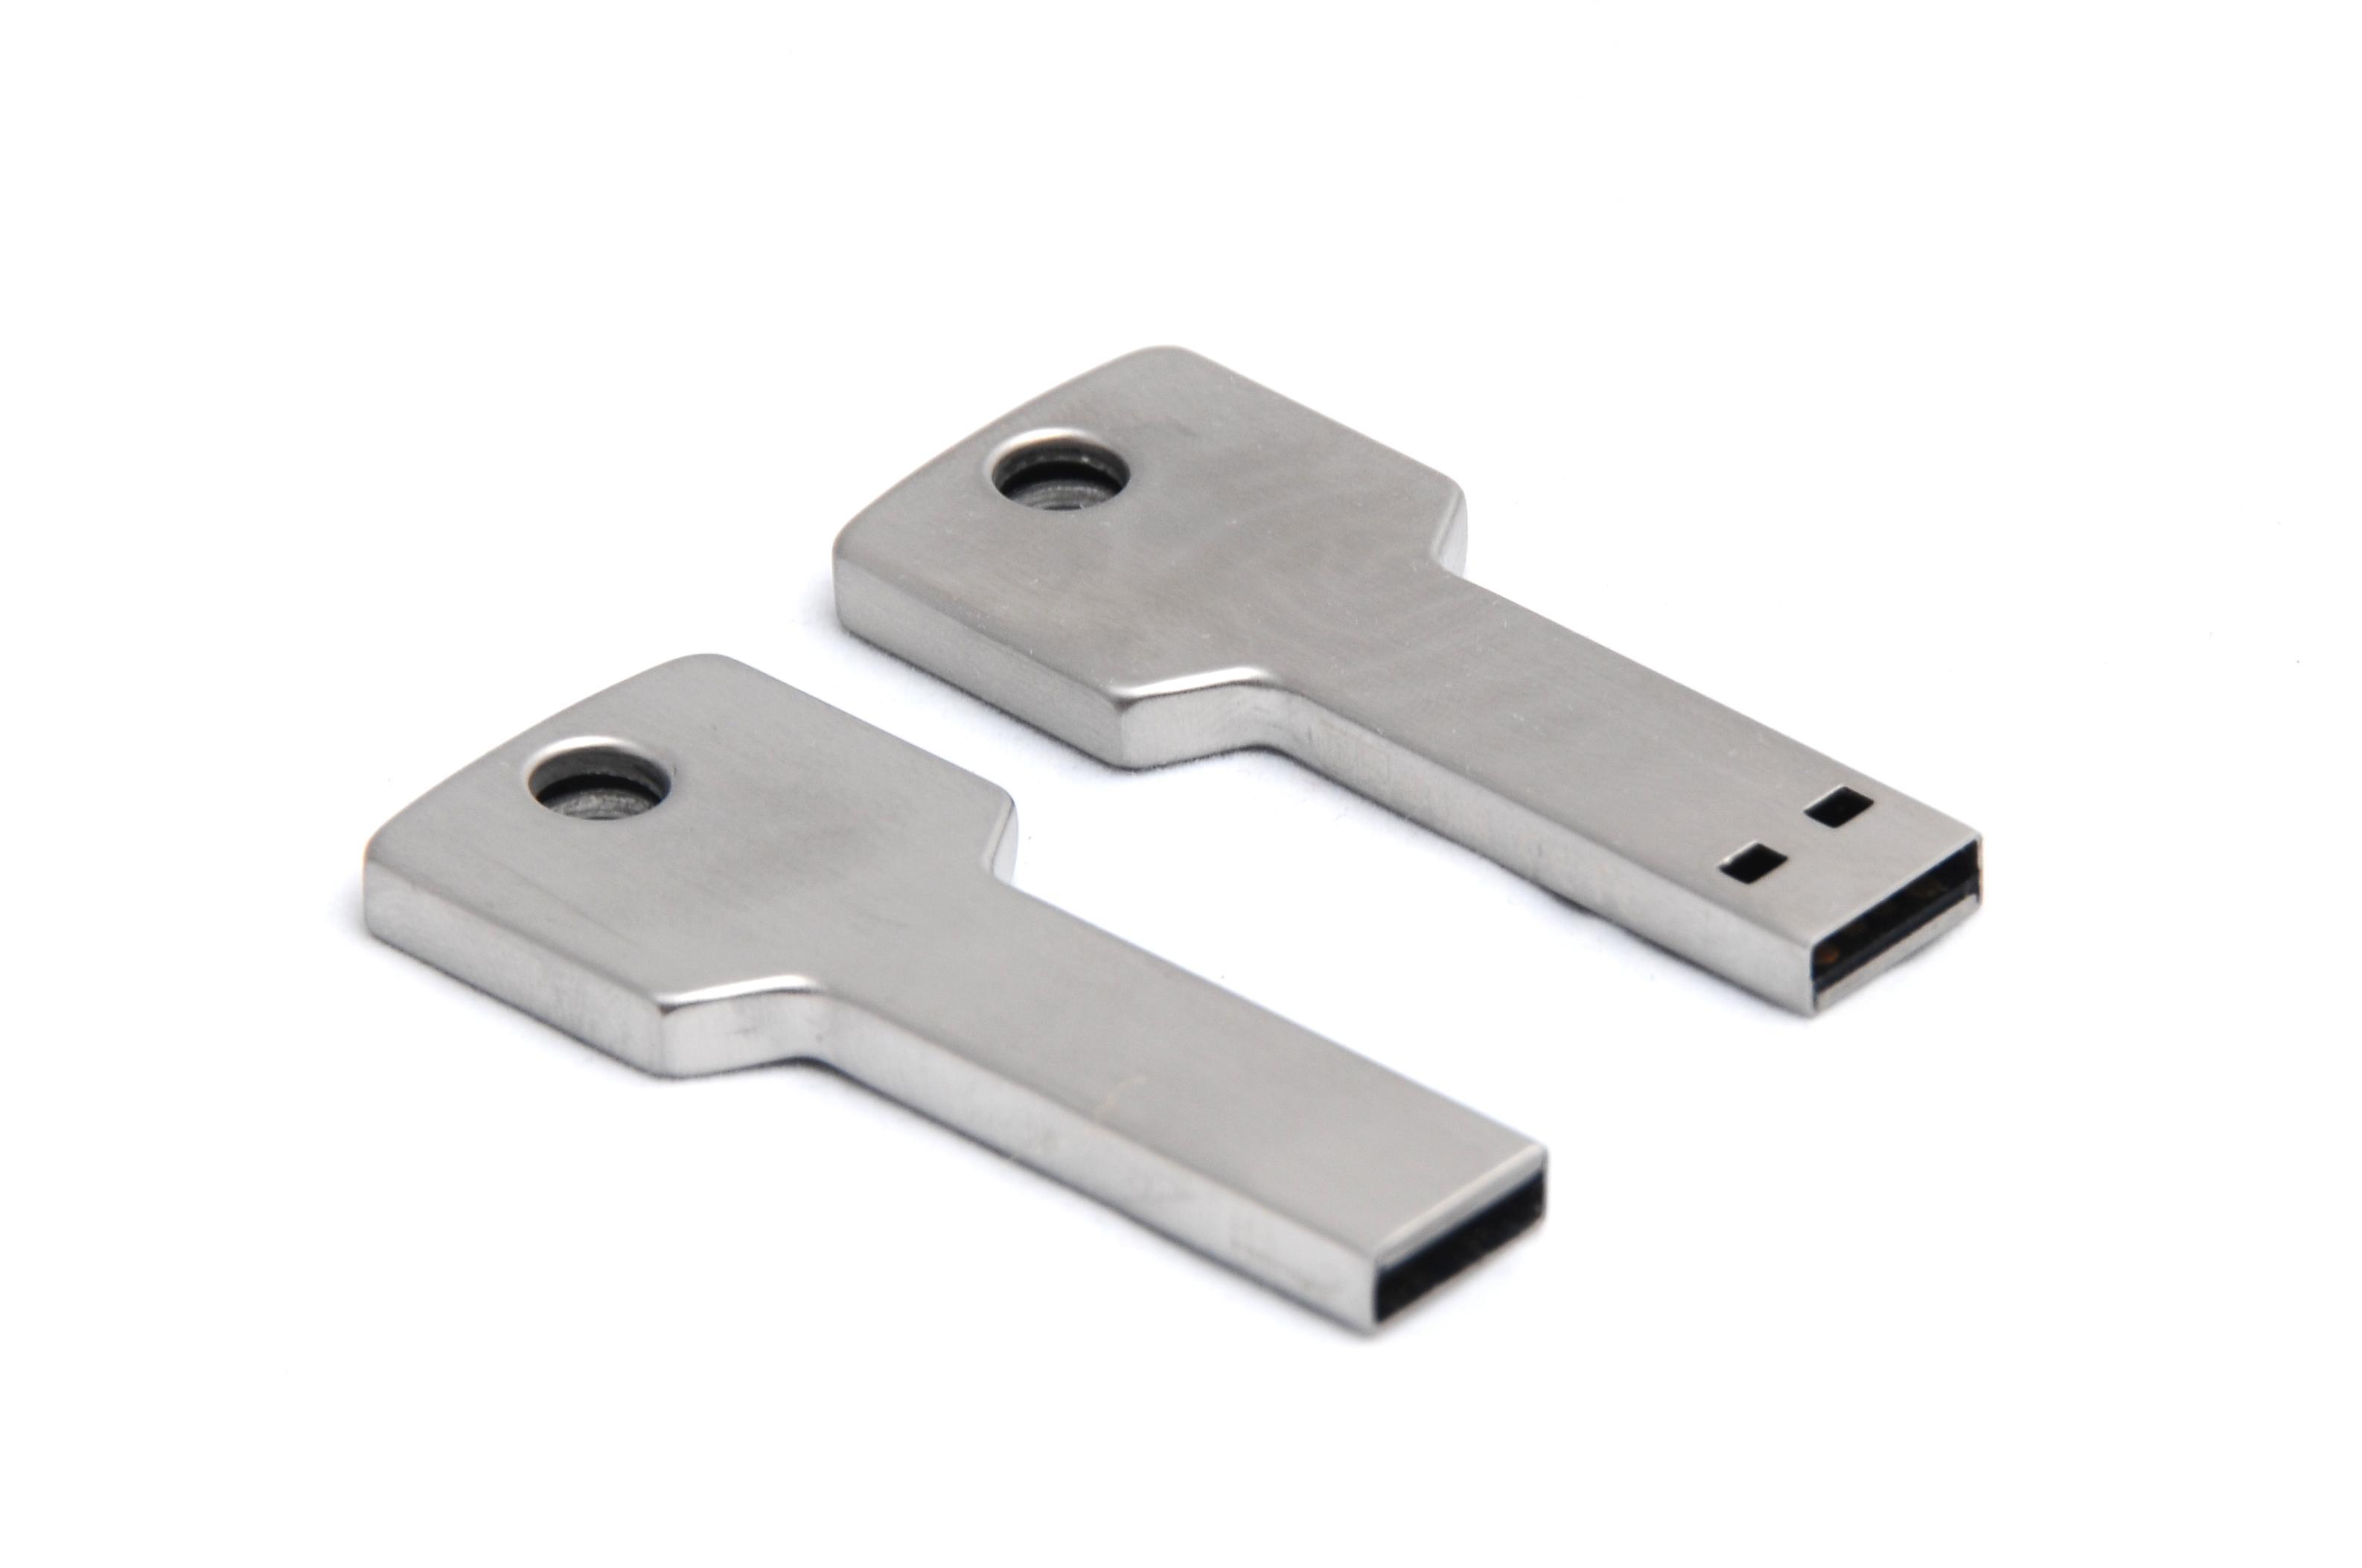 فلش مموری فلزی (کلیدی)